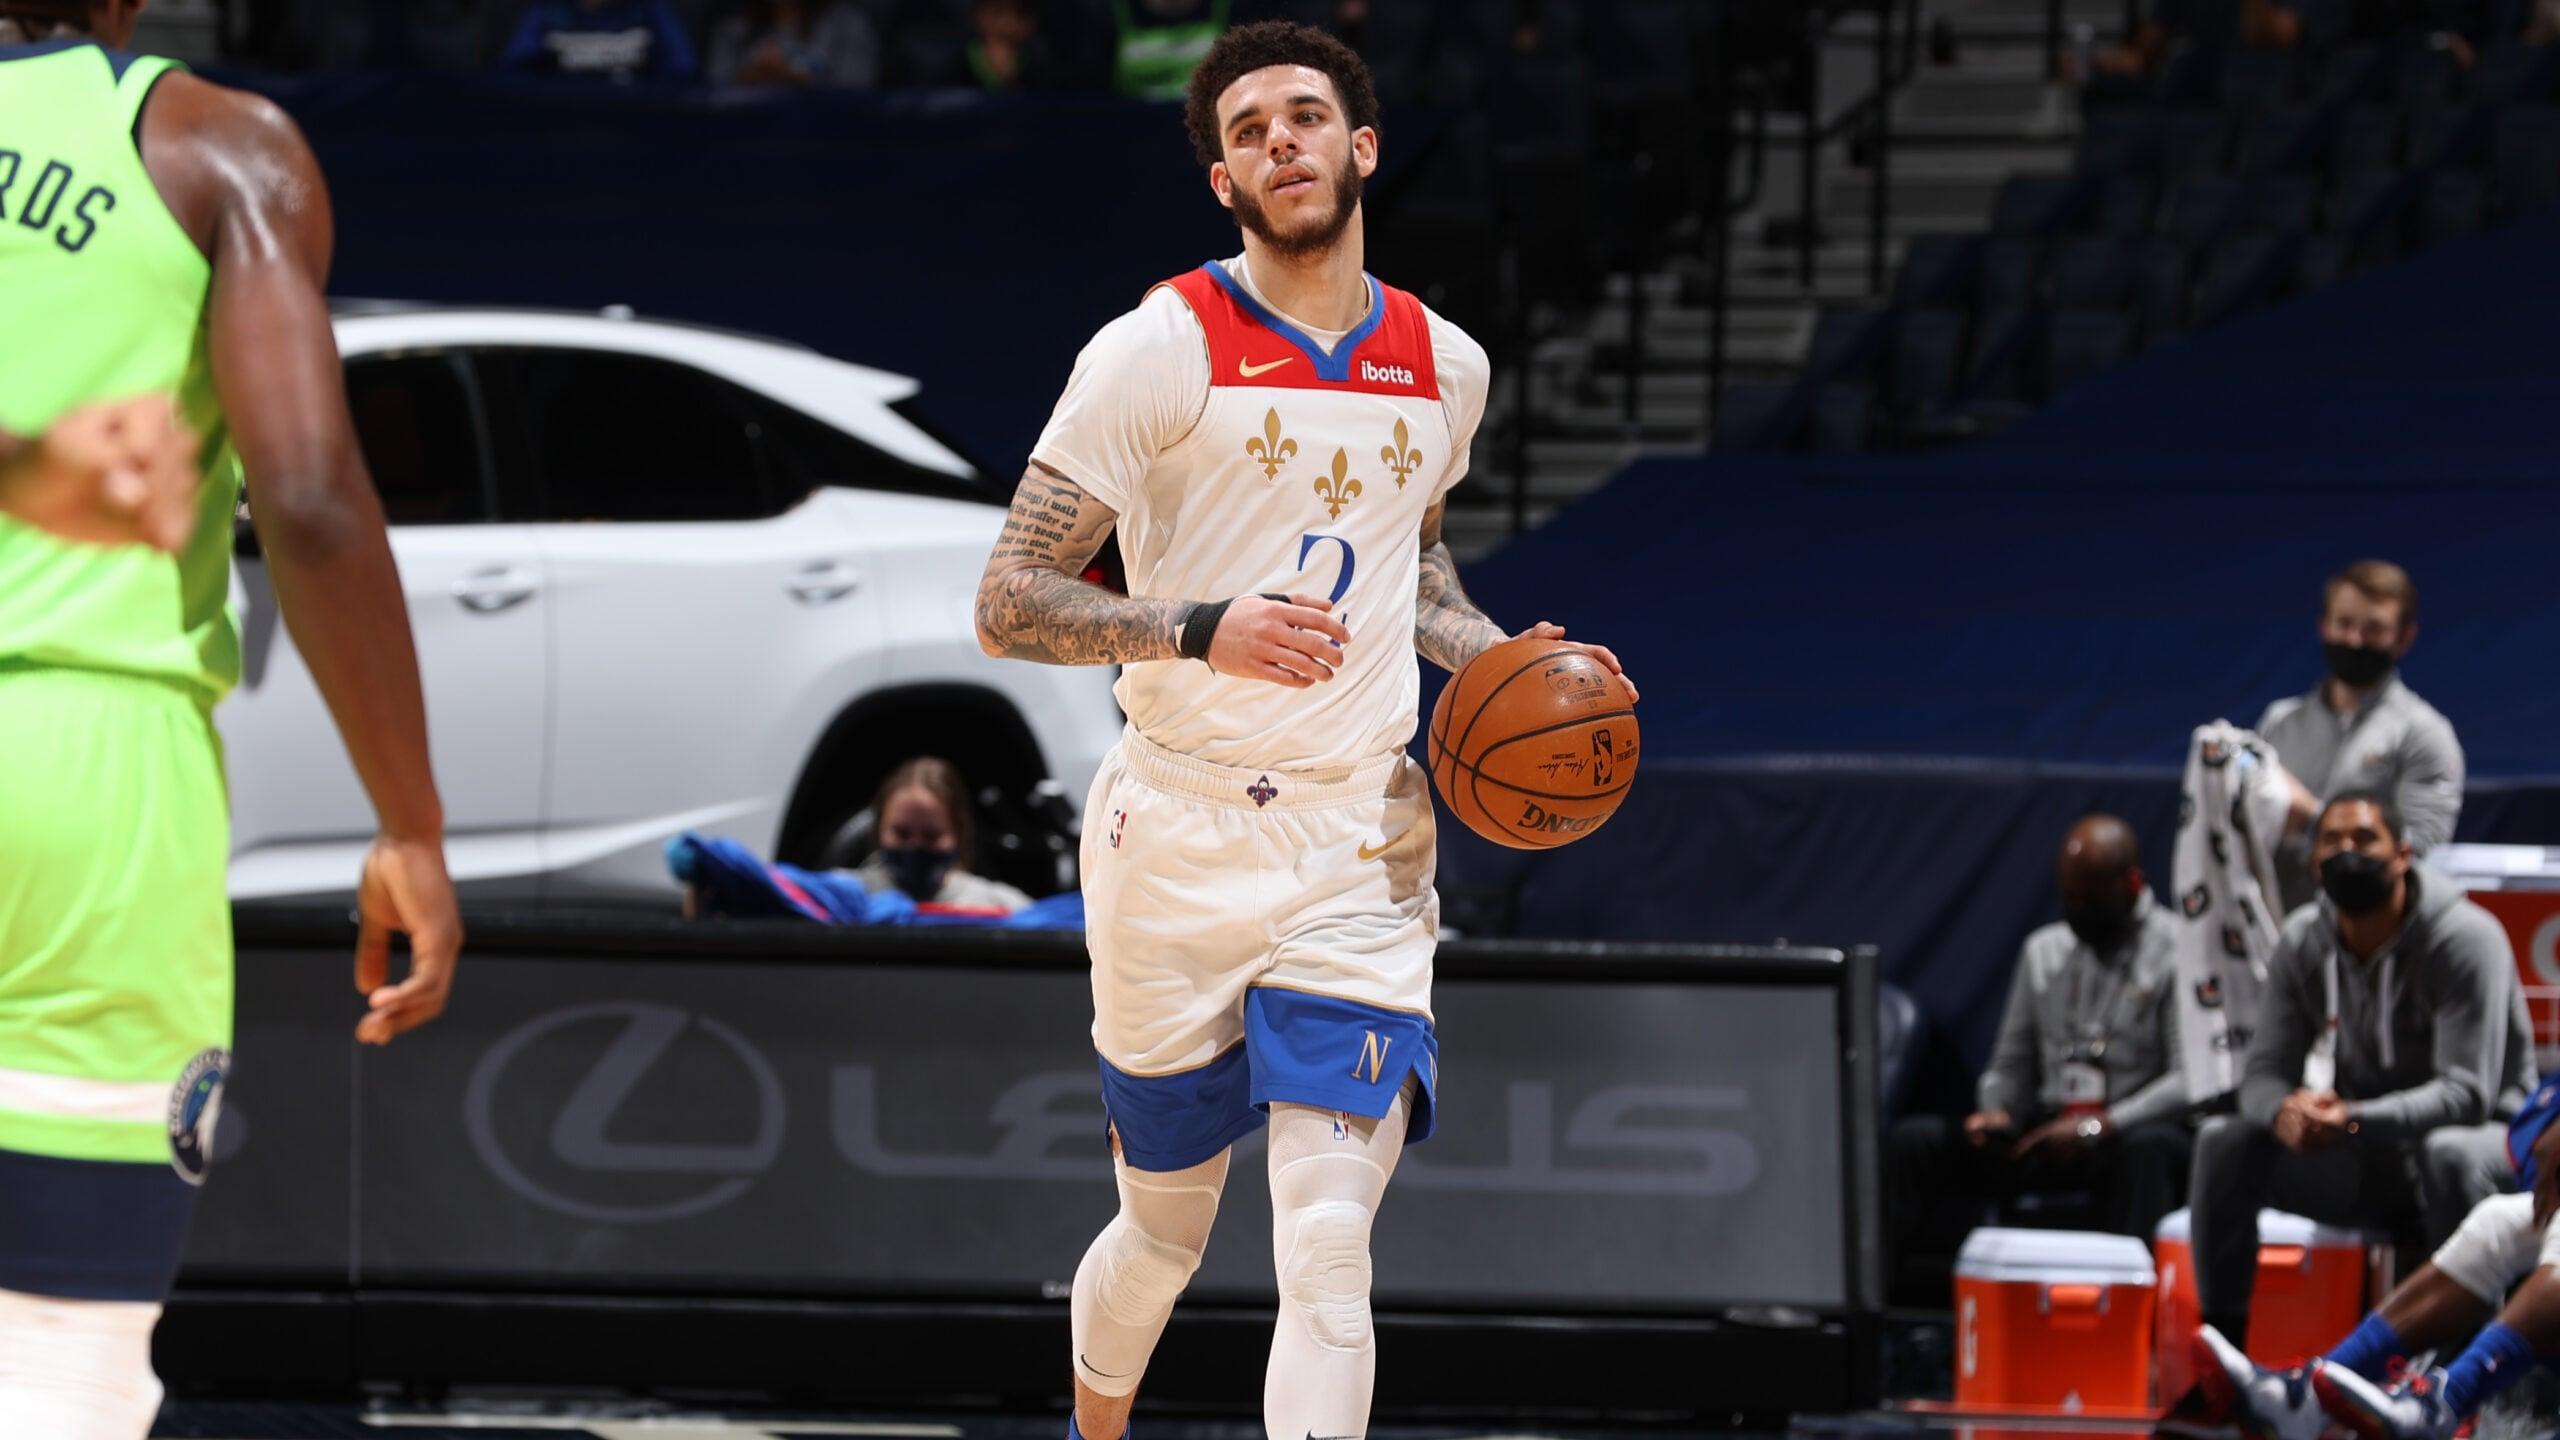 Pelicans Stat Leader Highlights: Lonzo Ball tallies 33 points vs. Minnesota Timberwolves